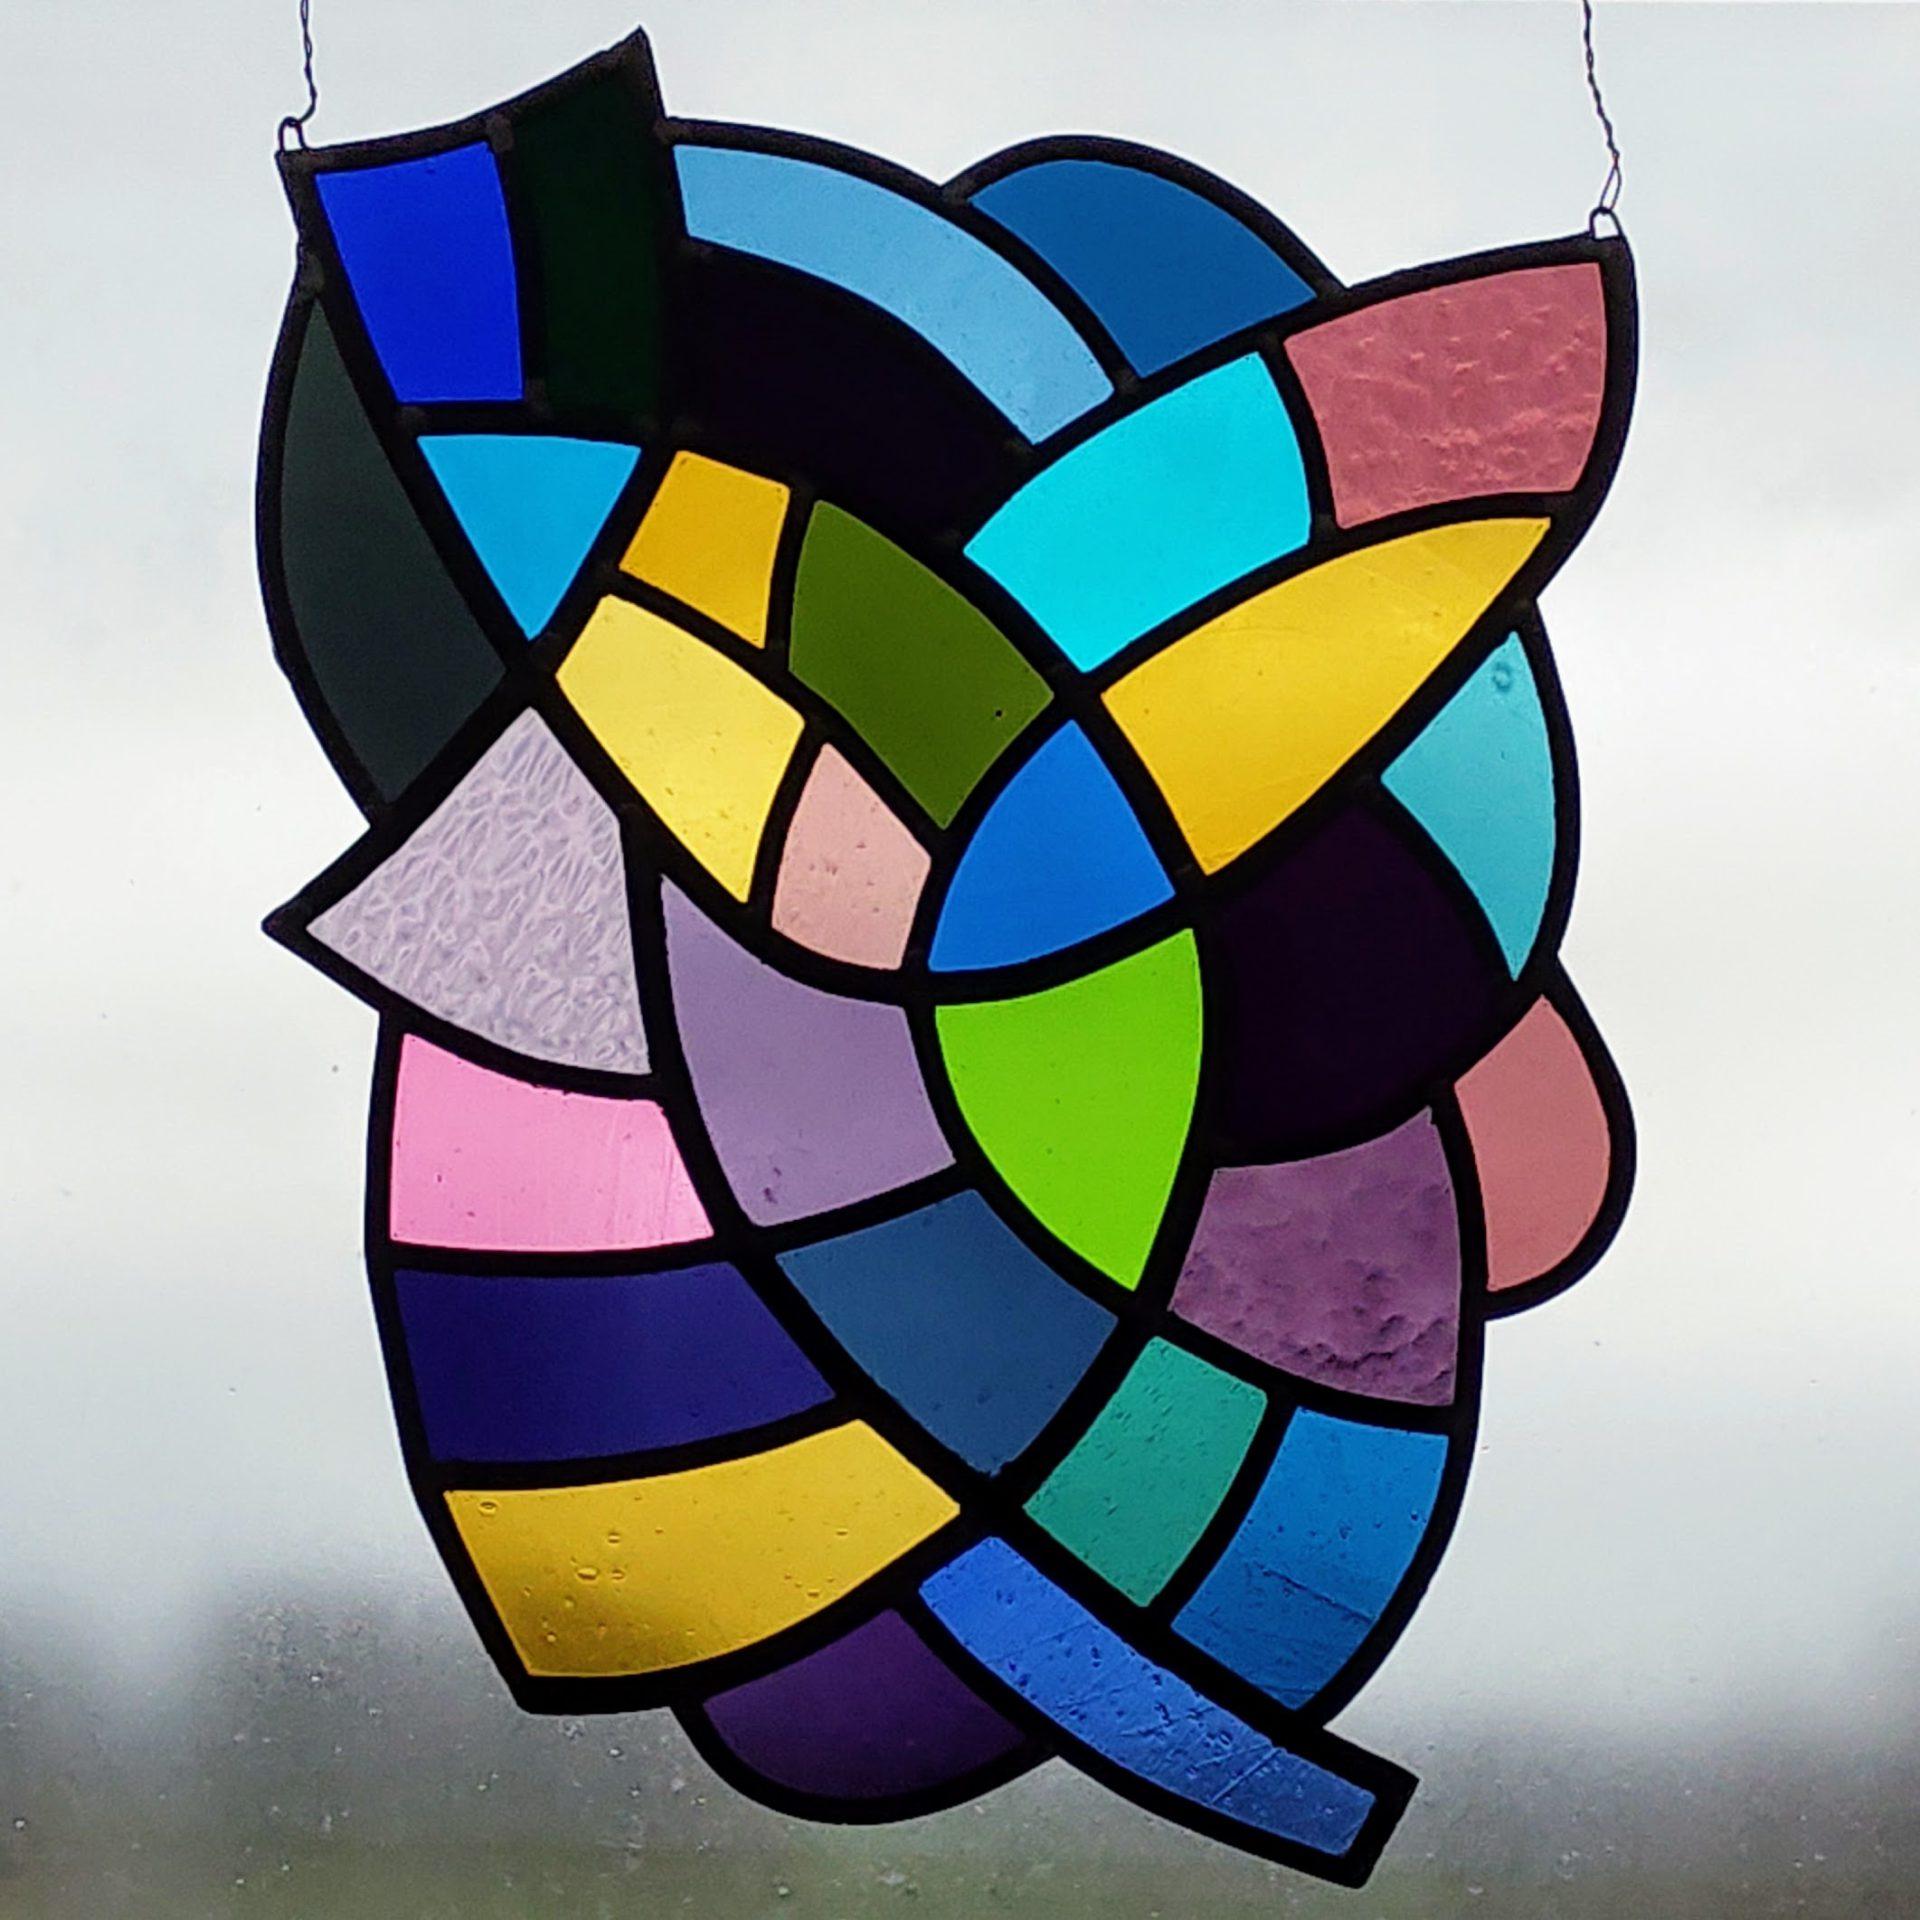 glasraam raamdecoratie vitrail stained glass decoration